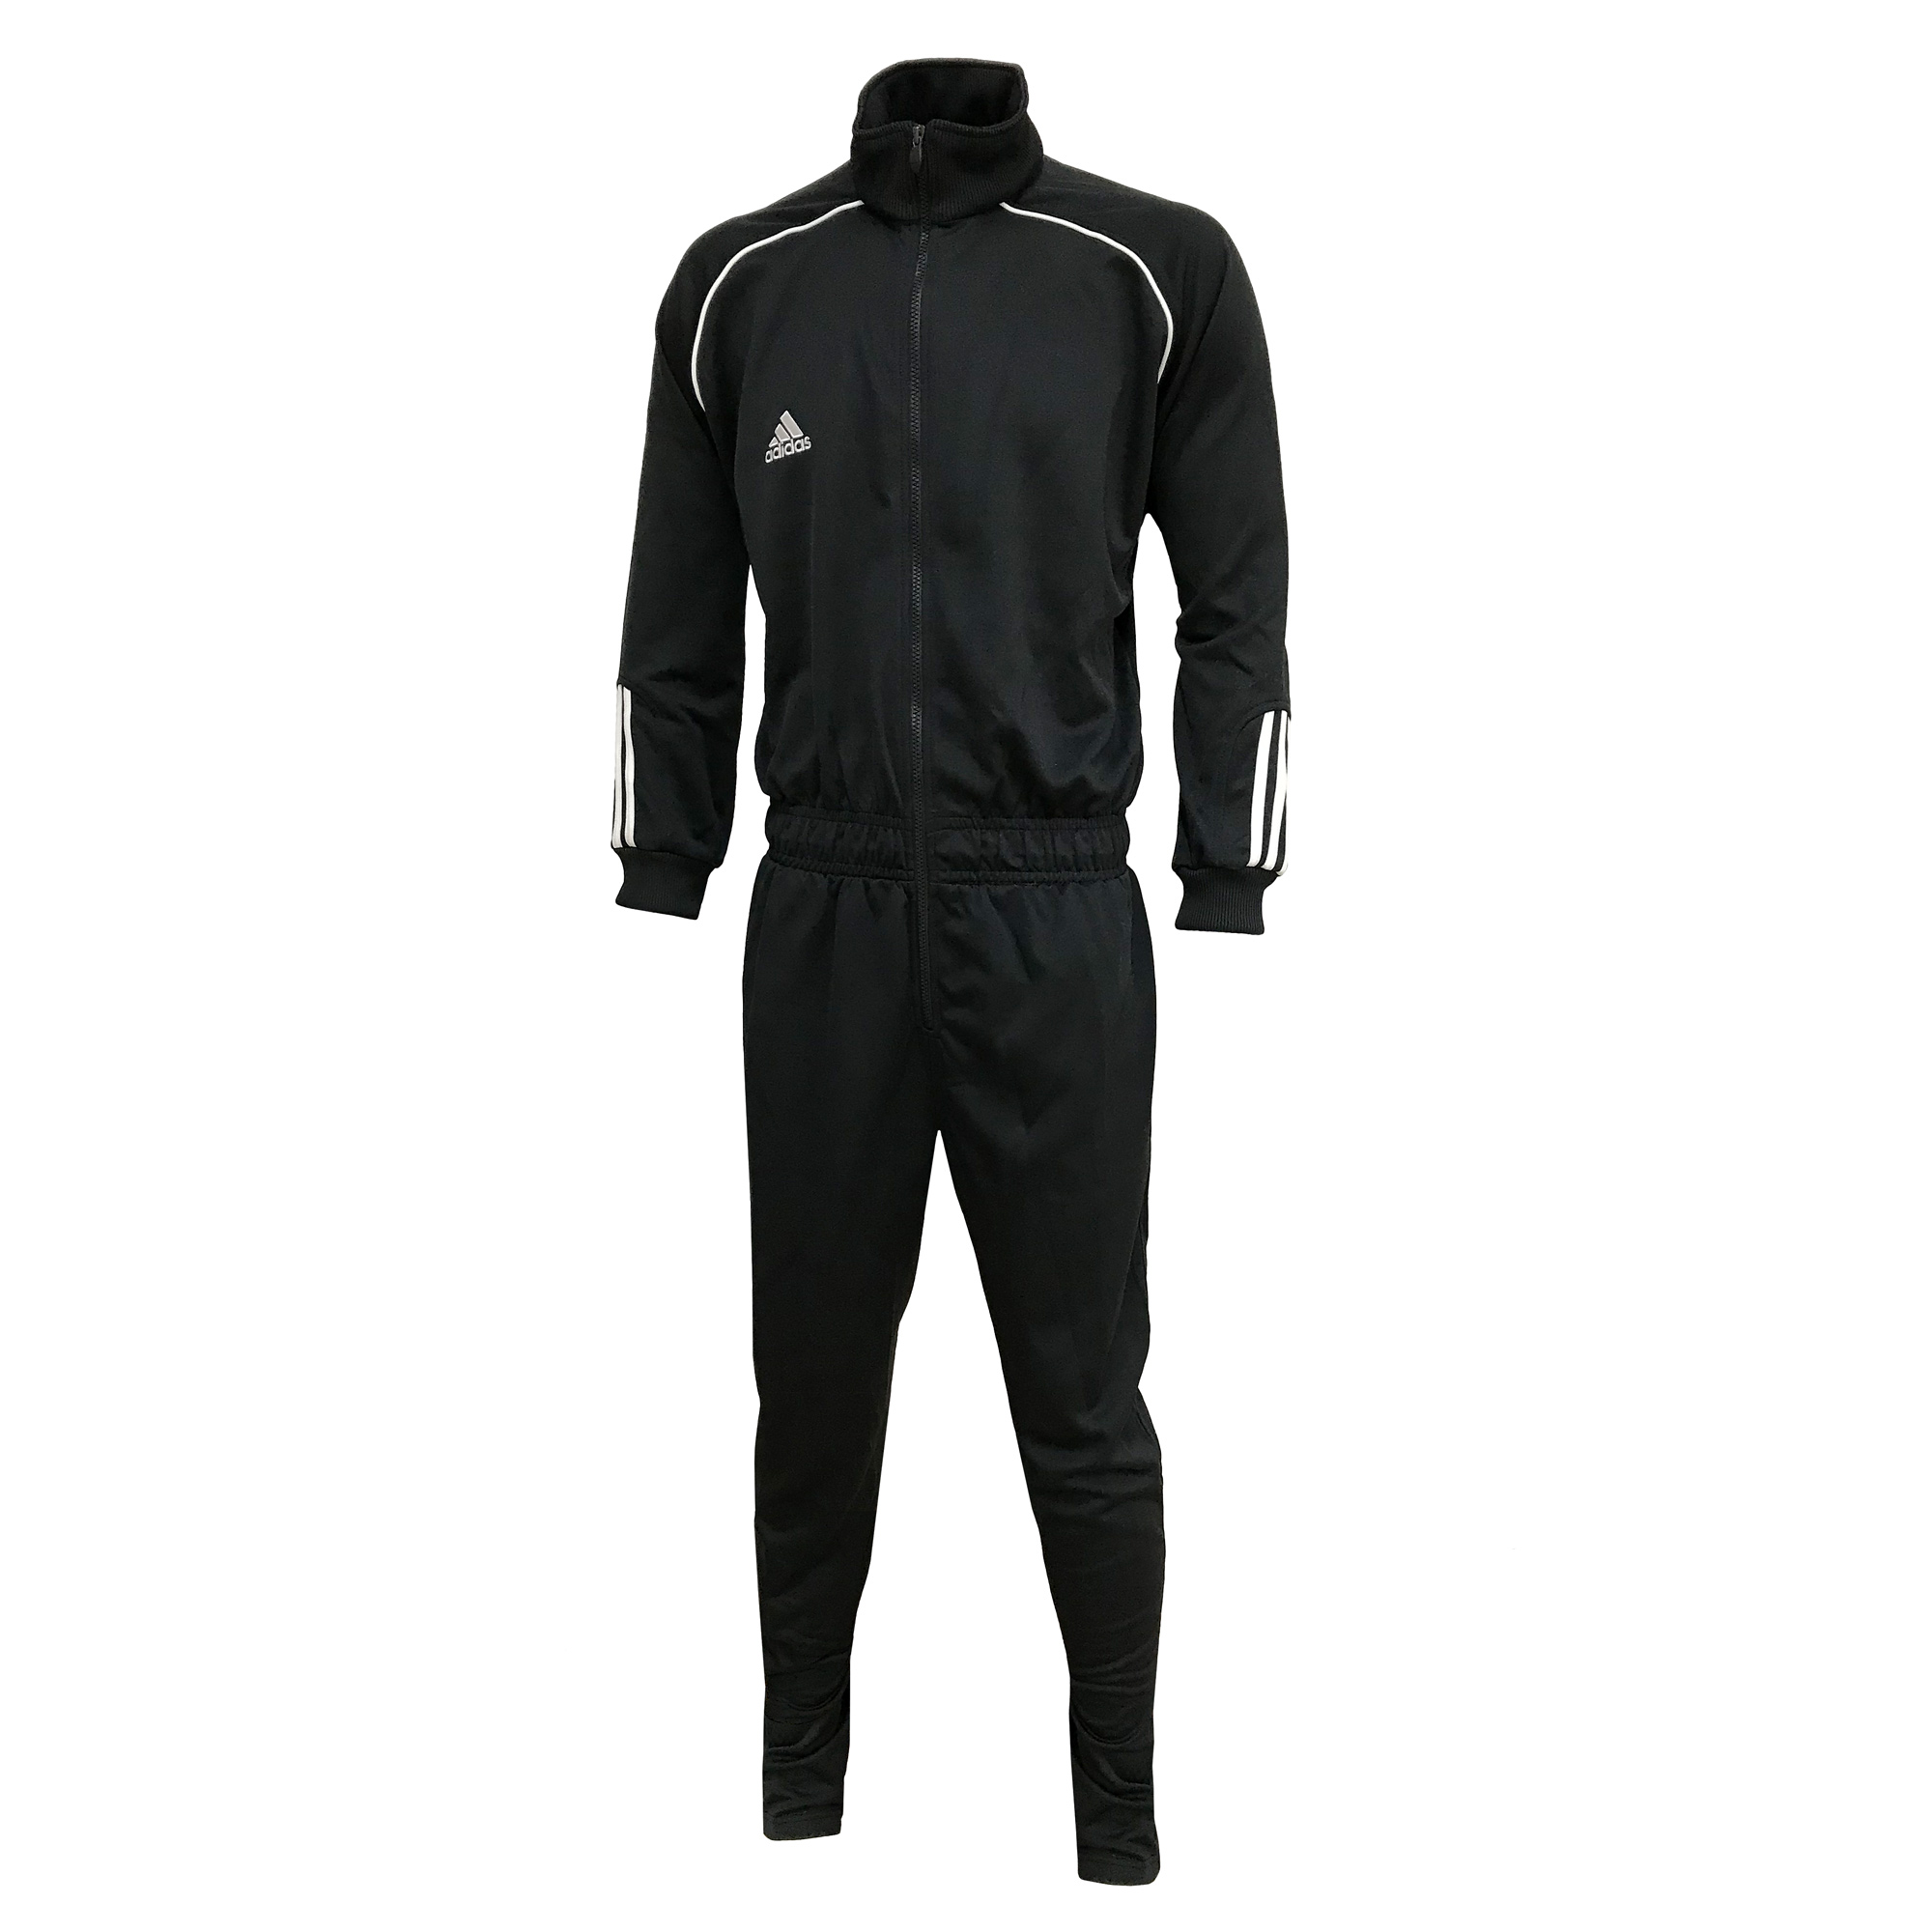 Adidas Squadra Herren Overall Fussball Trainingsanzug 296137 Schwarz Weiss